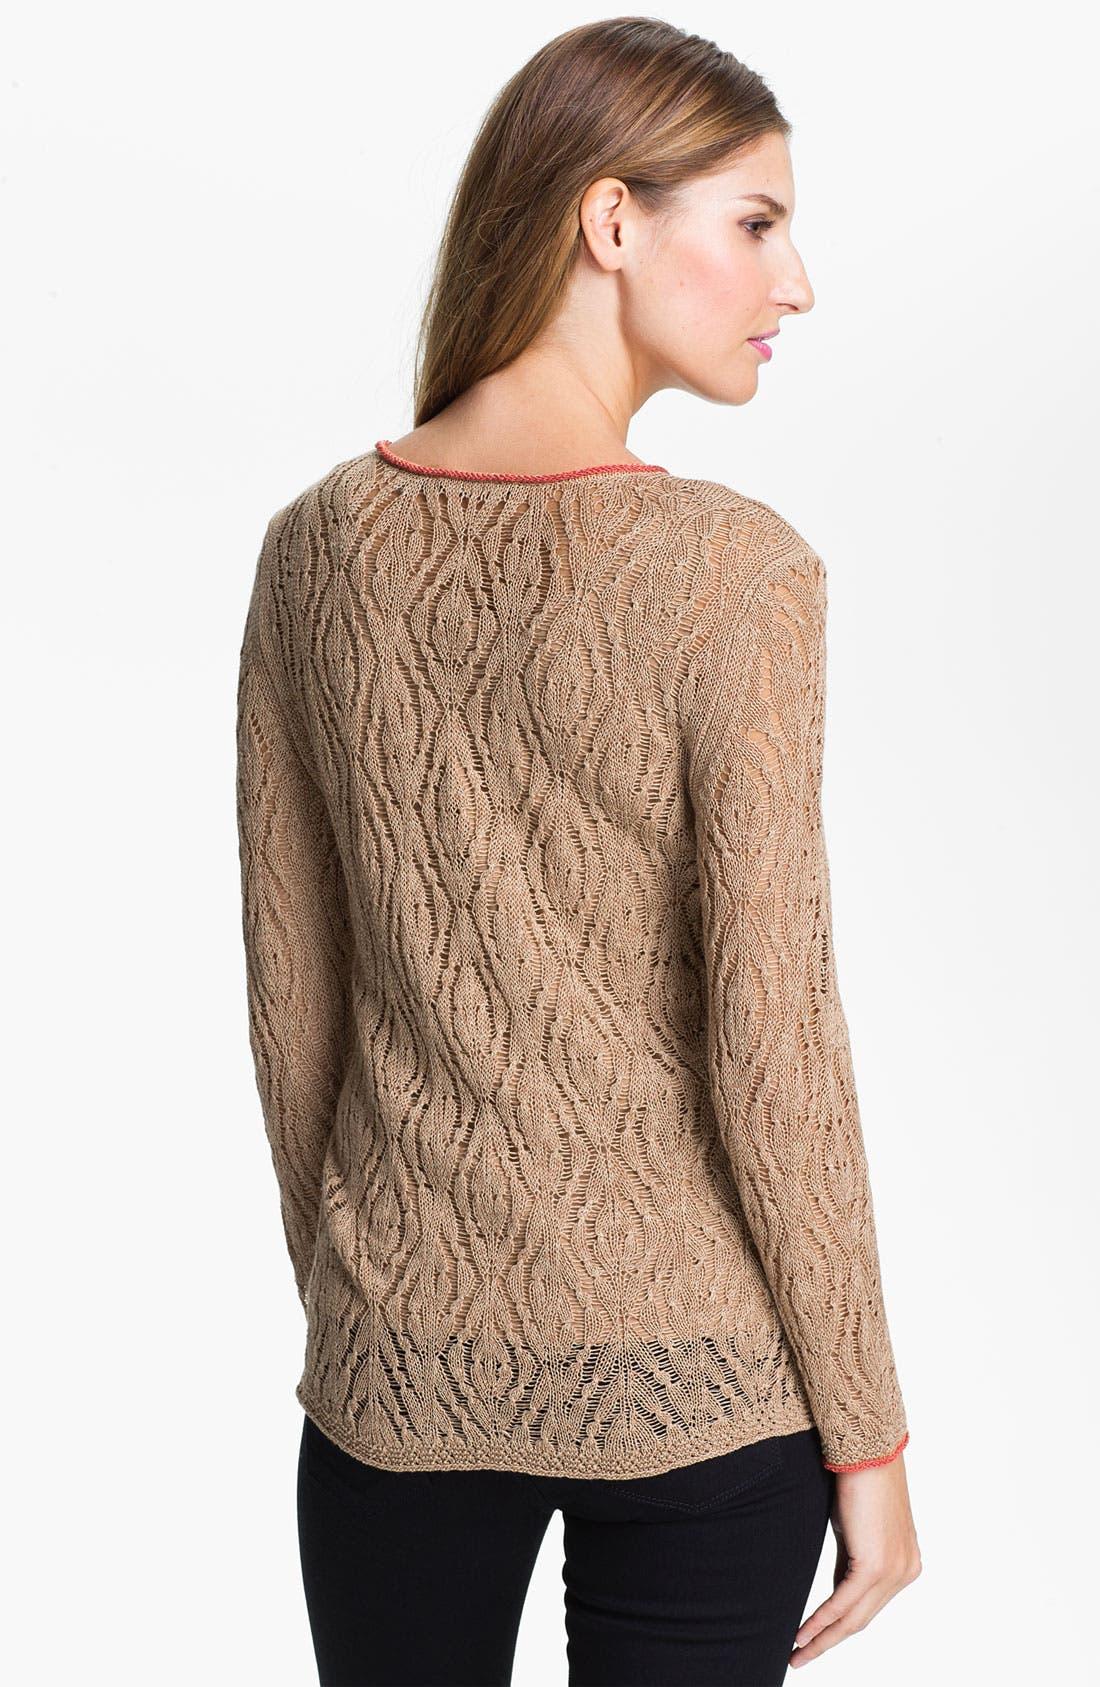 Nic + Zoe 'Starfish' Sweater,                             Alternate thumbnail 2, color,                             250